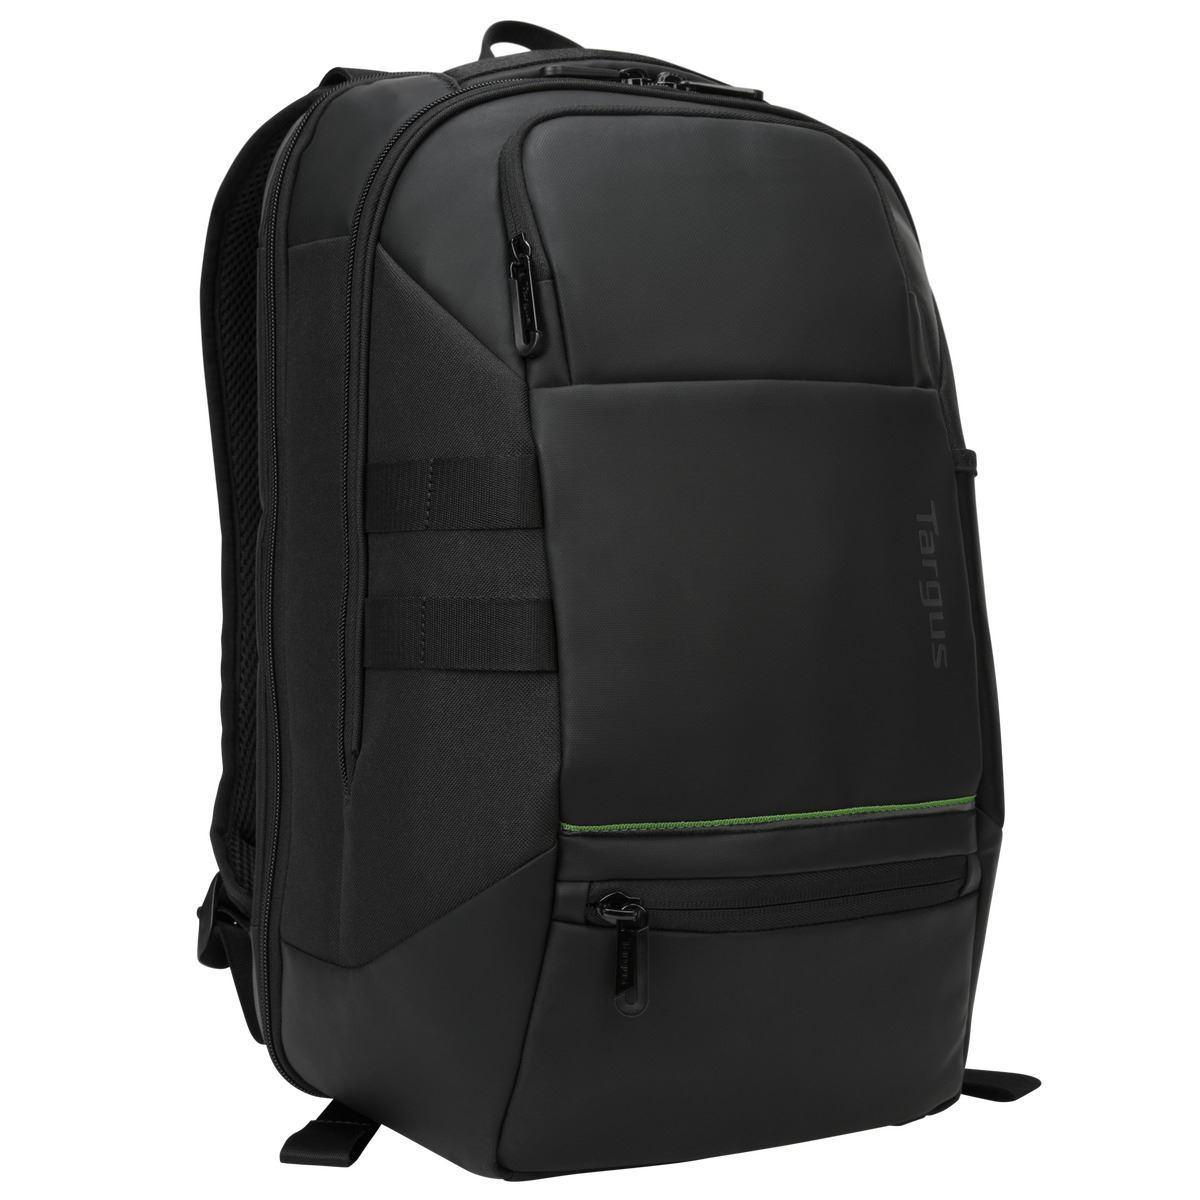 2022026-Targus-Balance-EcoSmart-14-borsa-per-notebook-35-6-cm-14-Zaino-Nero-T